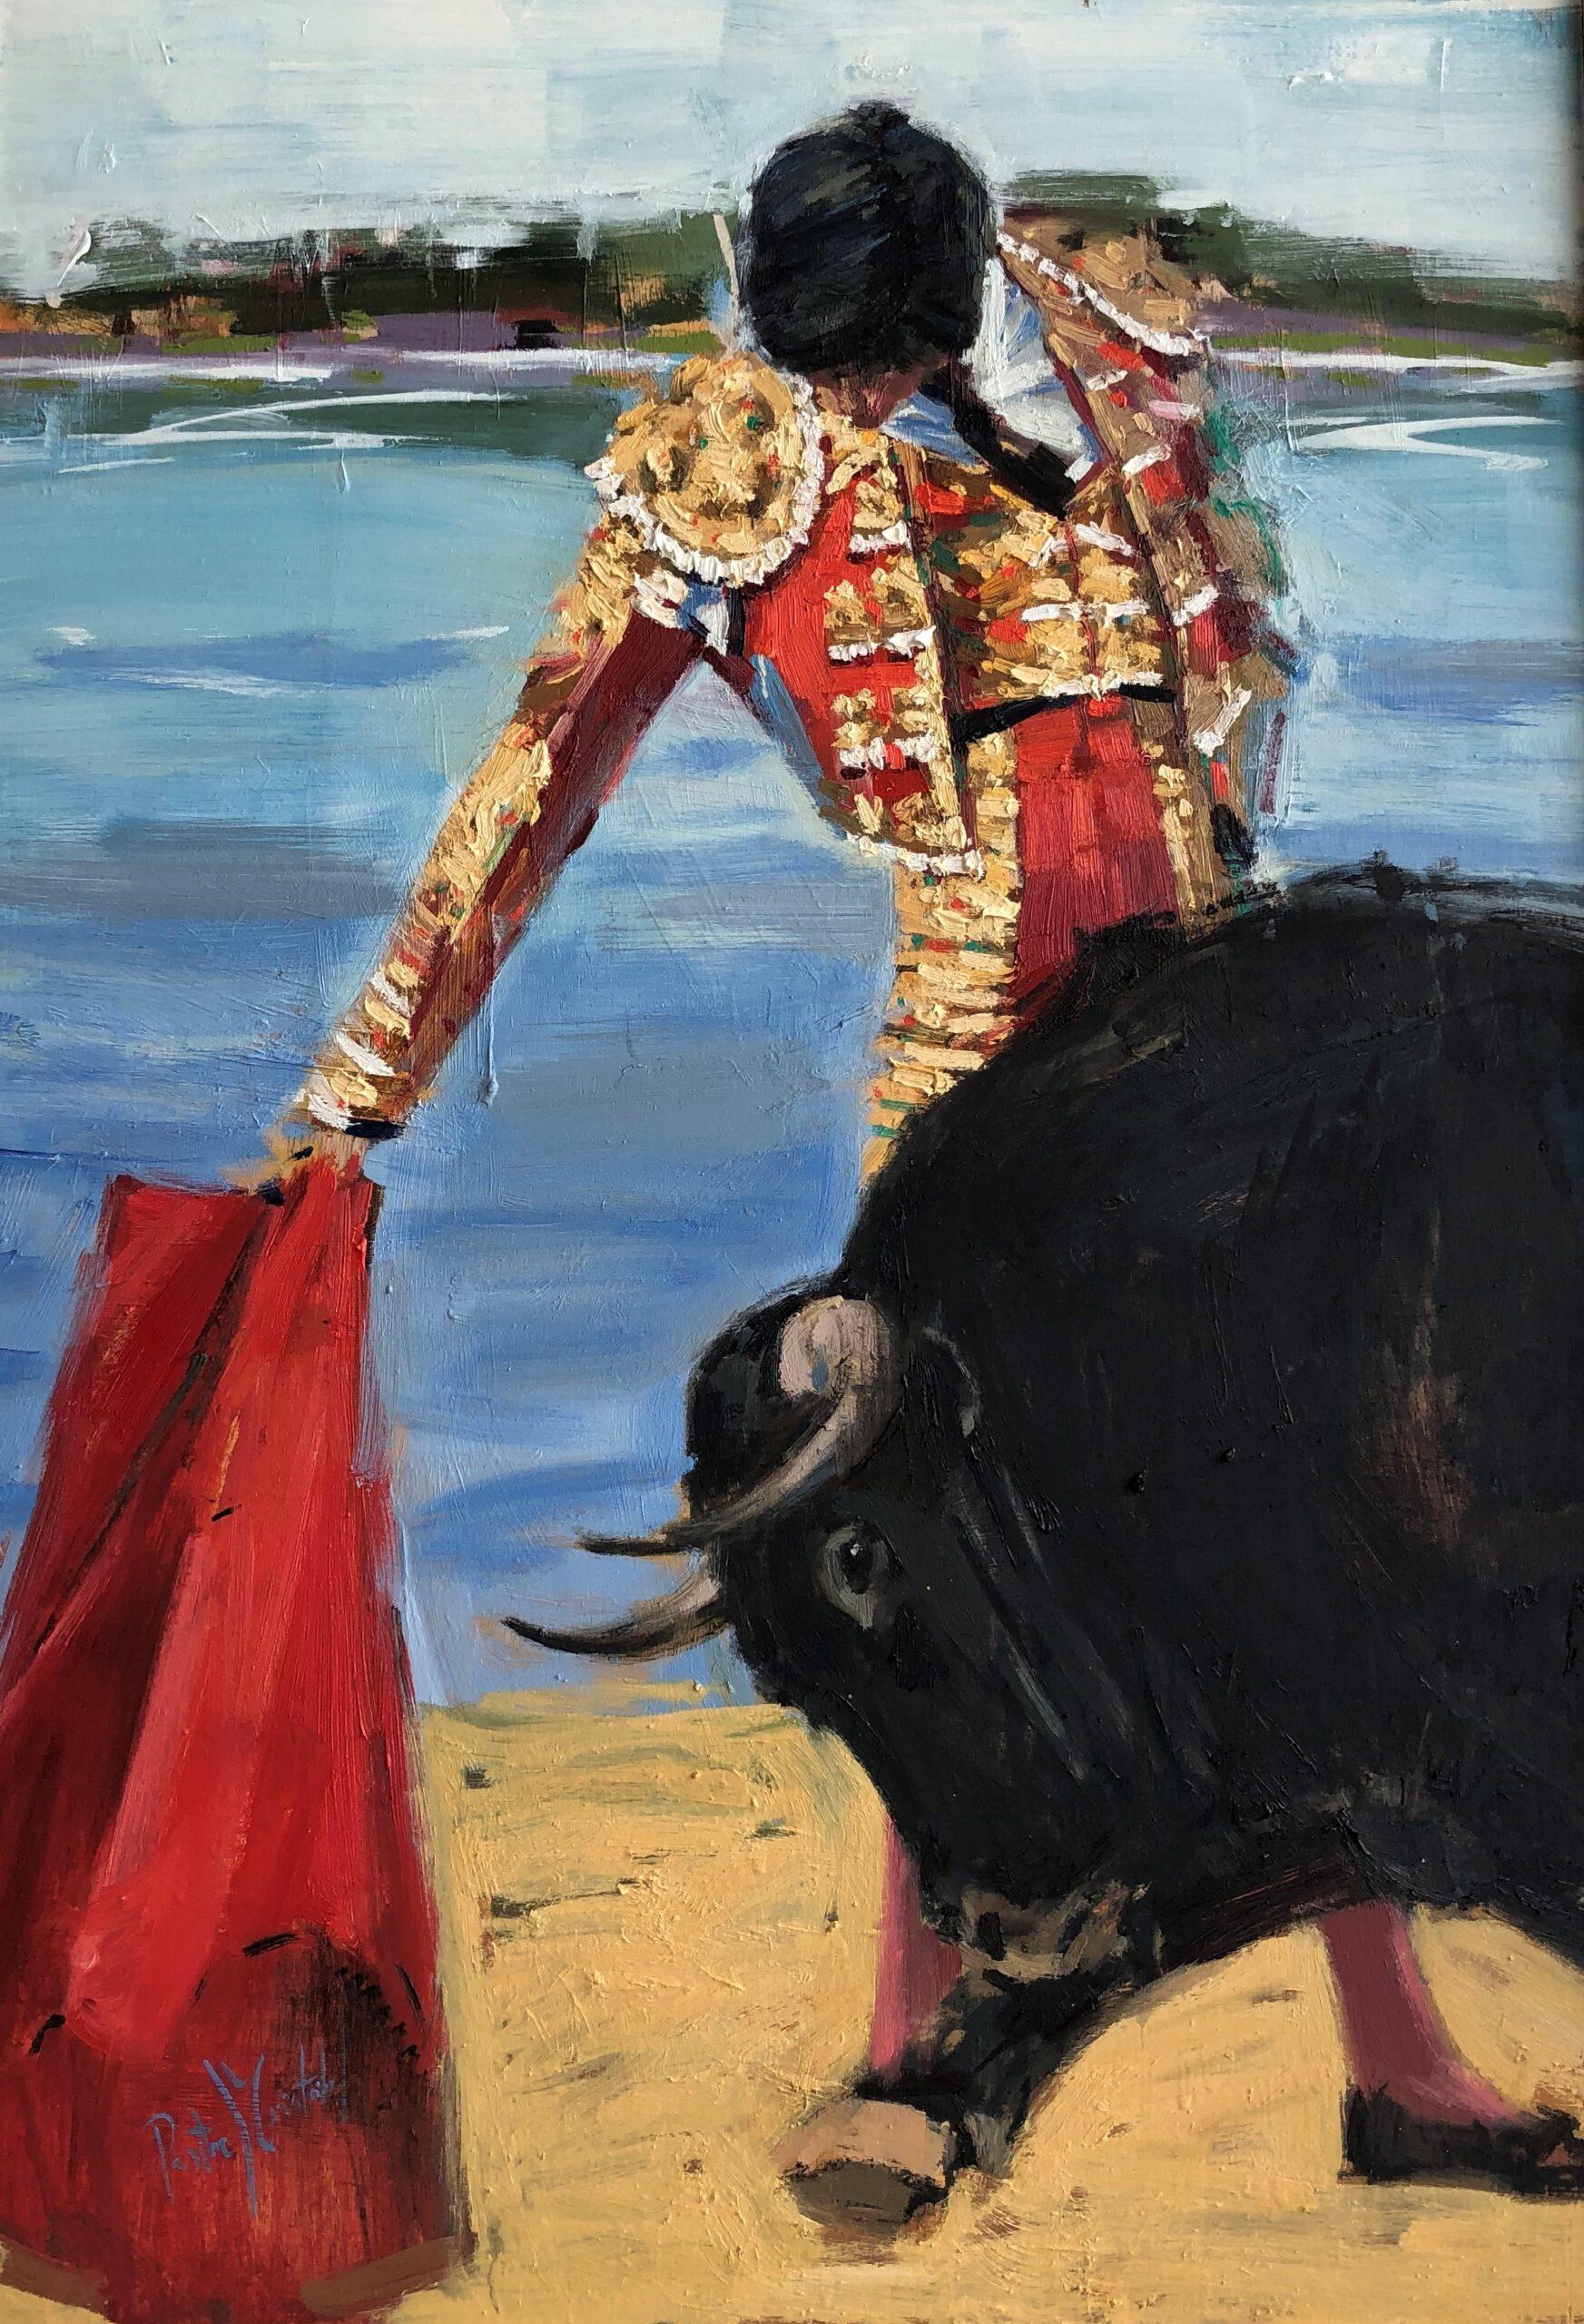 MARIO PASTOR CRISTÓBAL (SPAIN)